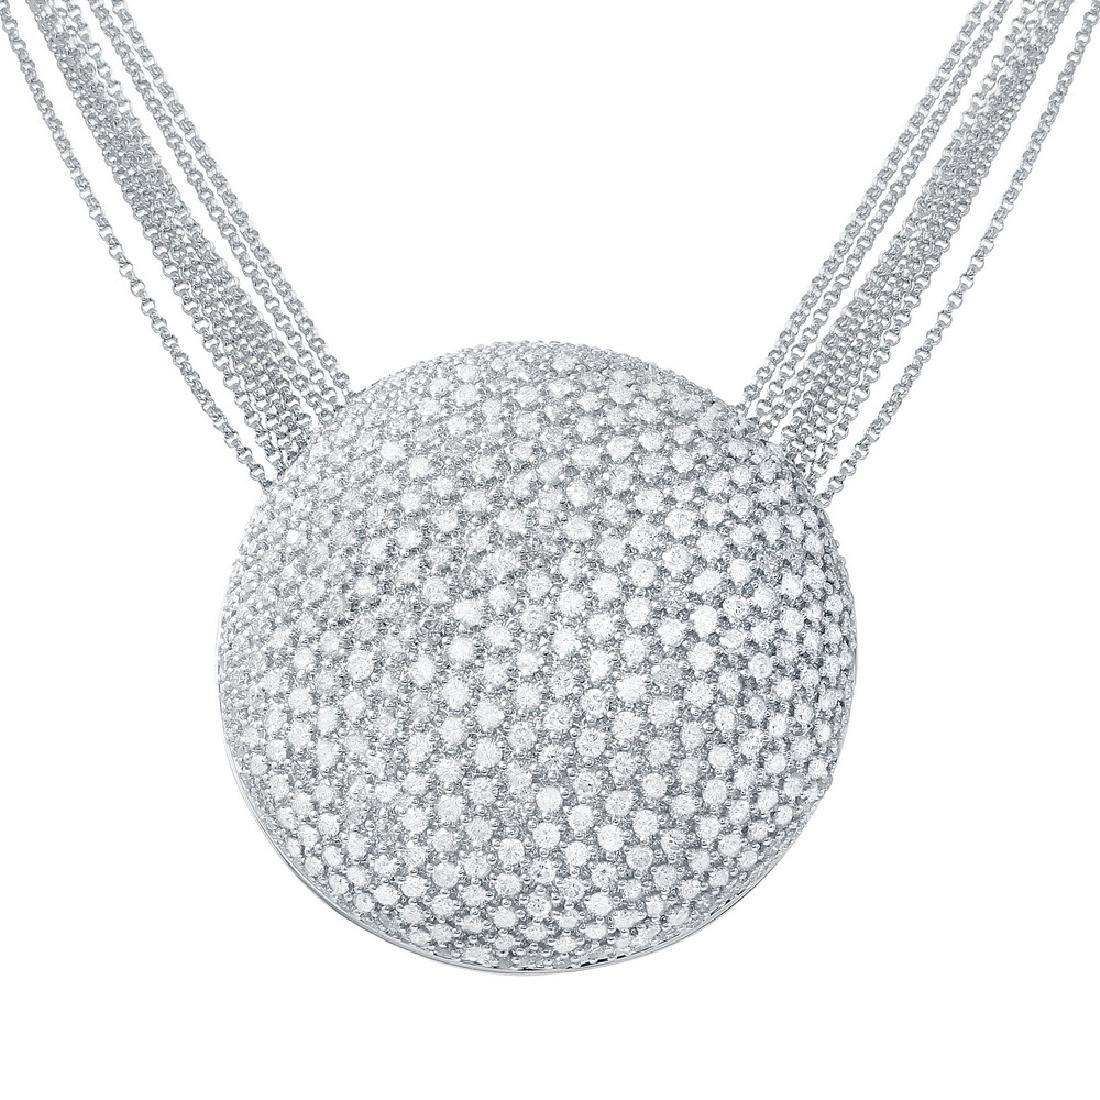 Genuine 6.78 TCW 14K White Gold Ladies Necklace